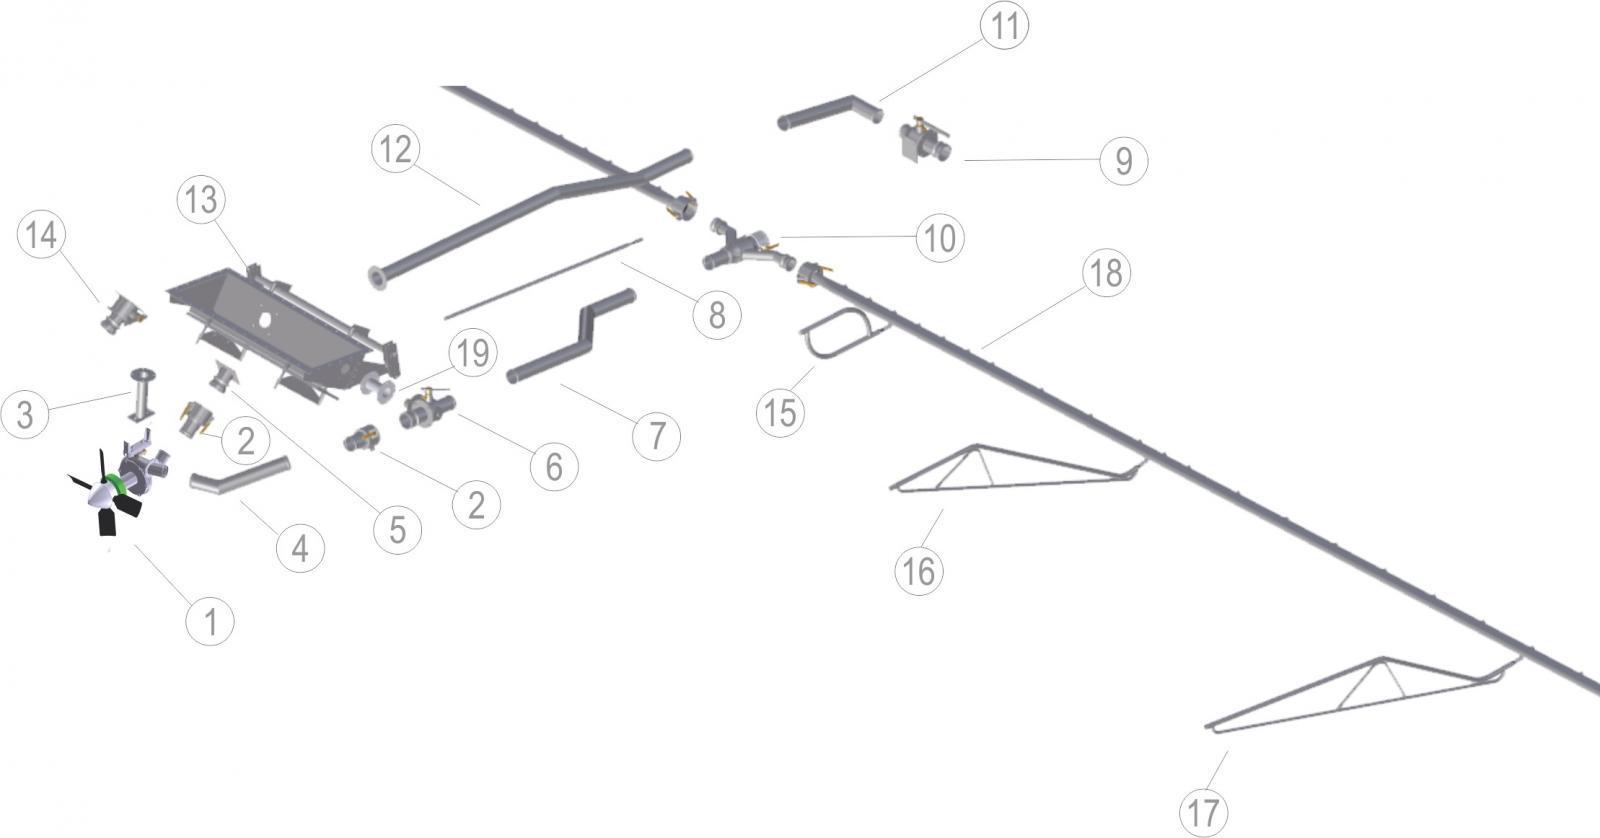 CESSNA 188 SPRAY SYSTEM